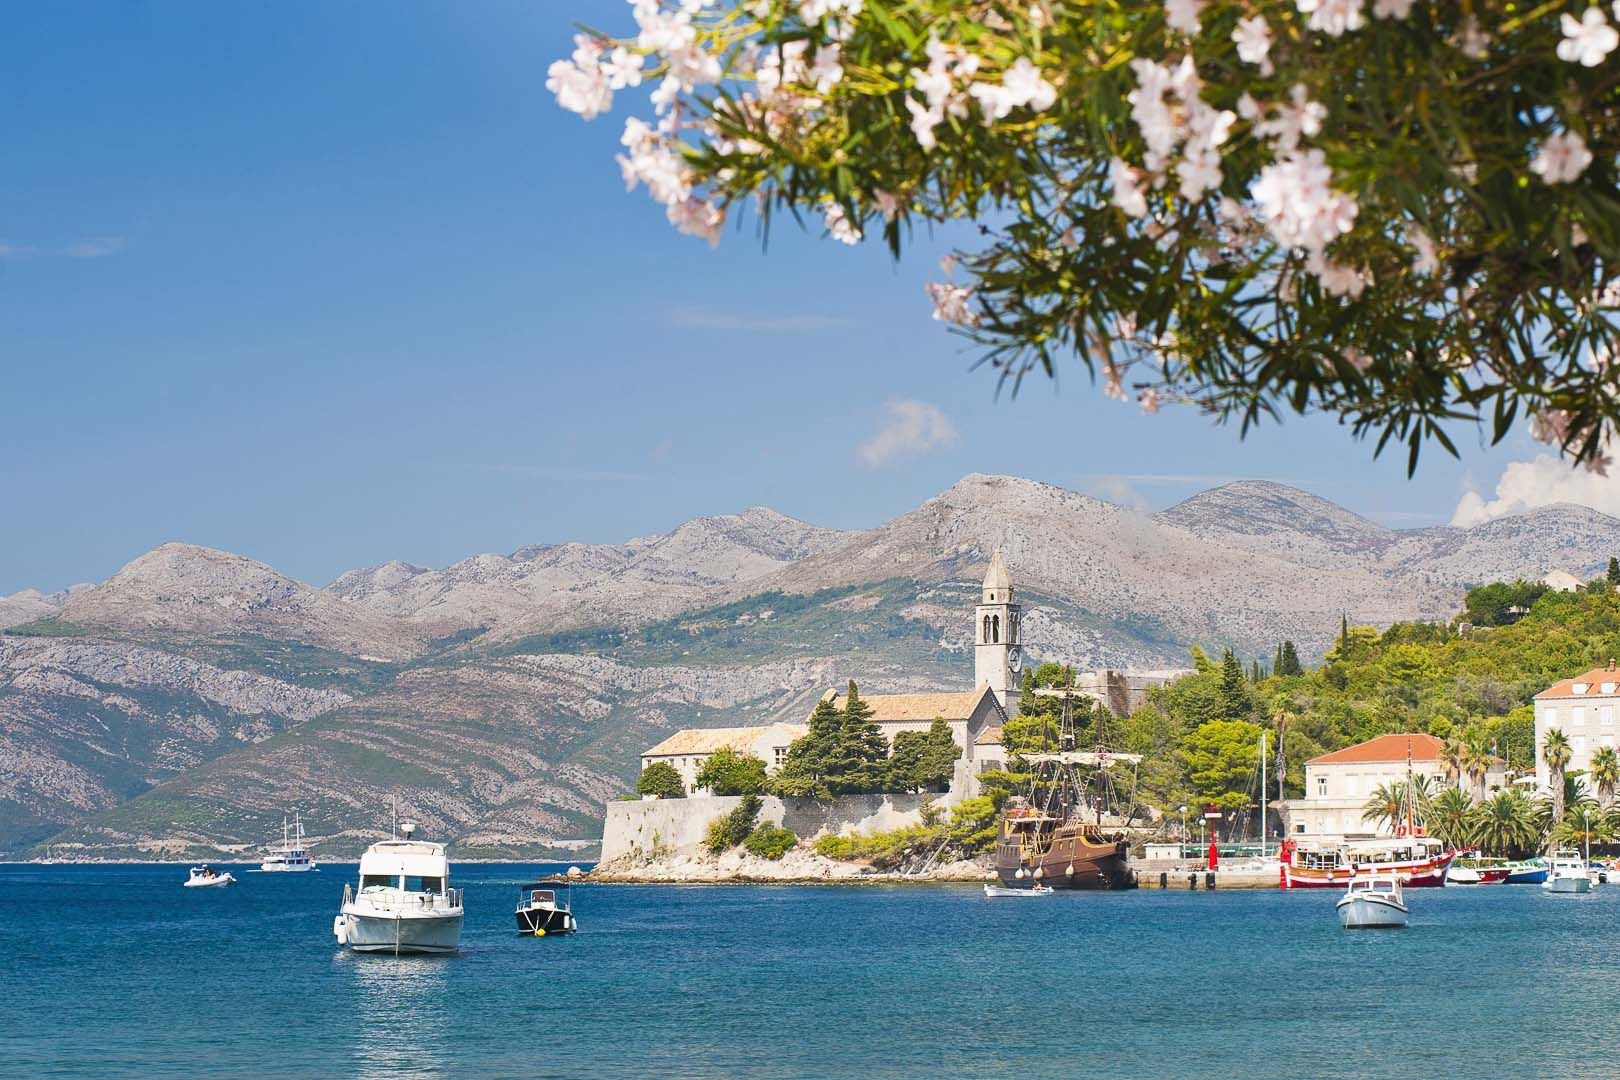 lopud croatia Google Search Honeymoon Travels Pinterest